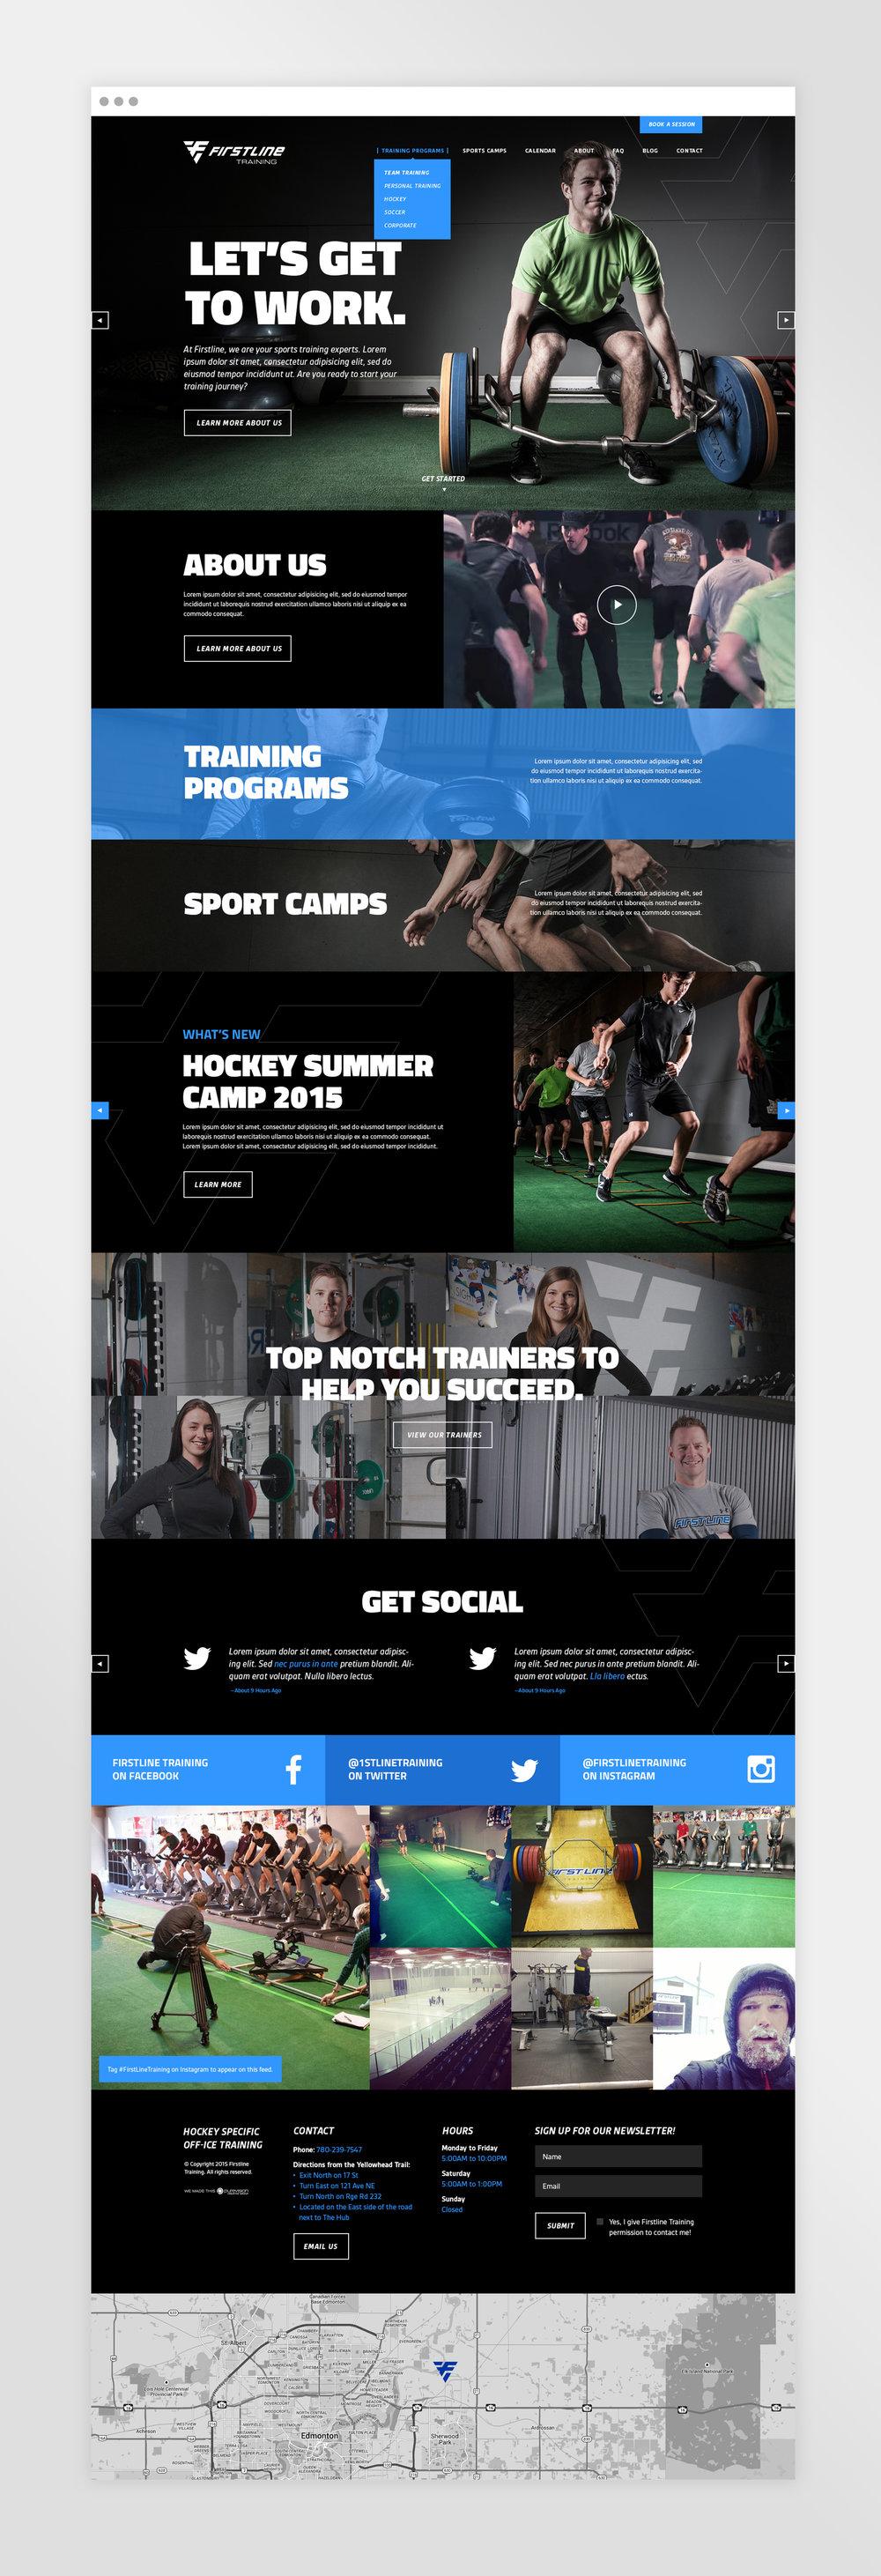 Natasia Designs Edmonton Freelance Graphic and Website Designer Firstline Fitness Training Web Design and Development